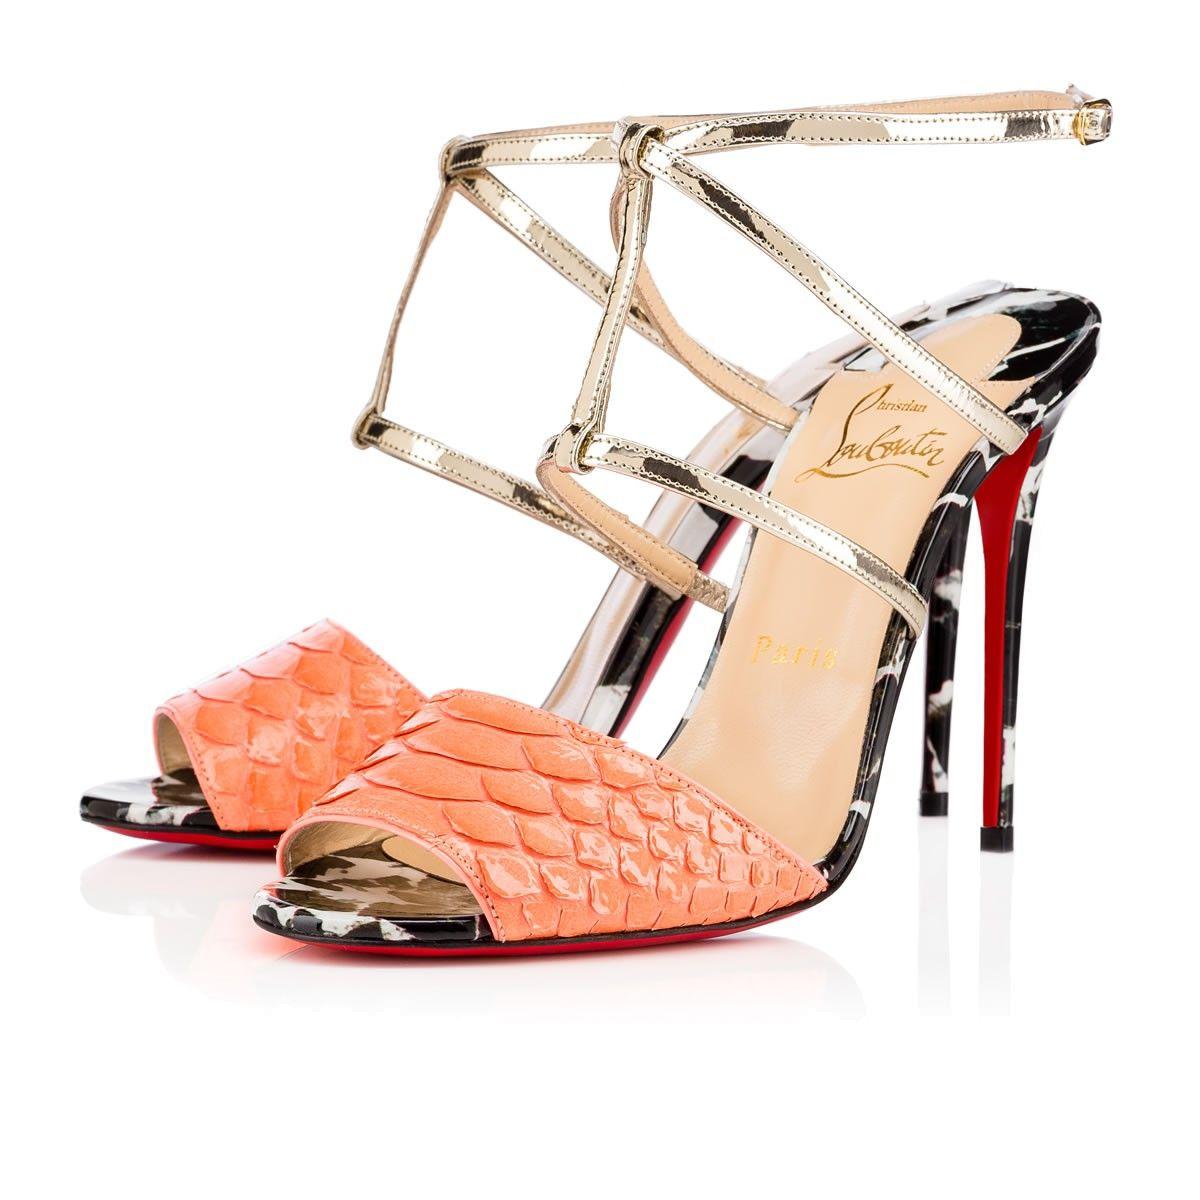 95d552c7e81 ... get christian louboutin lovabrida 100mm version flamingo python.  christianlouboutin shoes 581c2 6c685